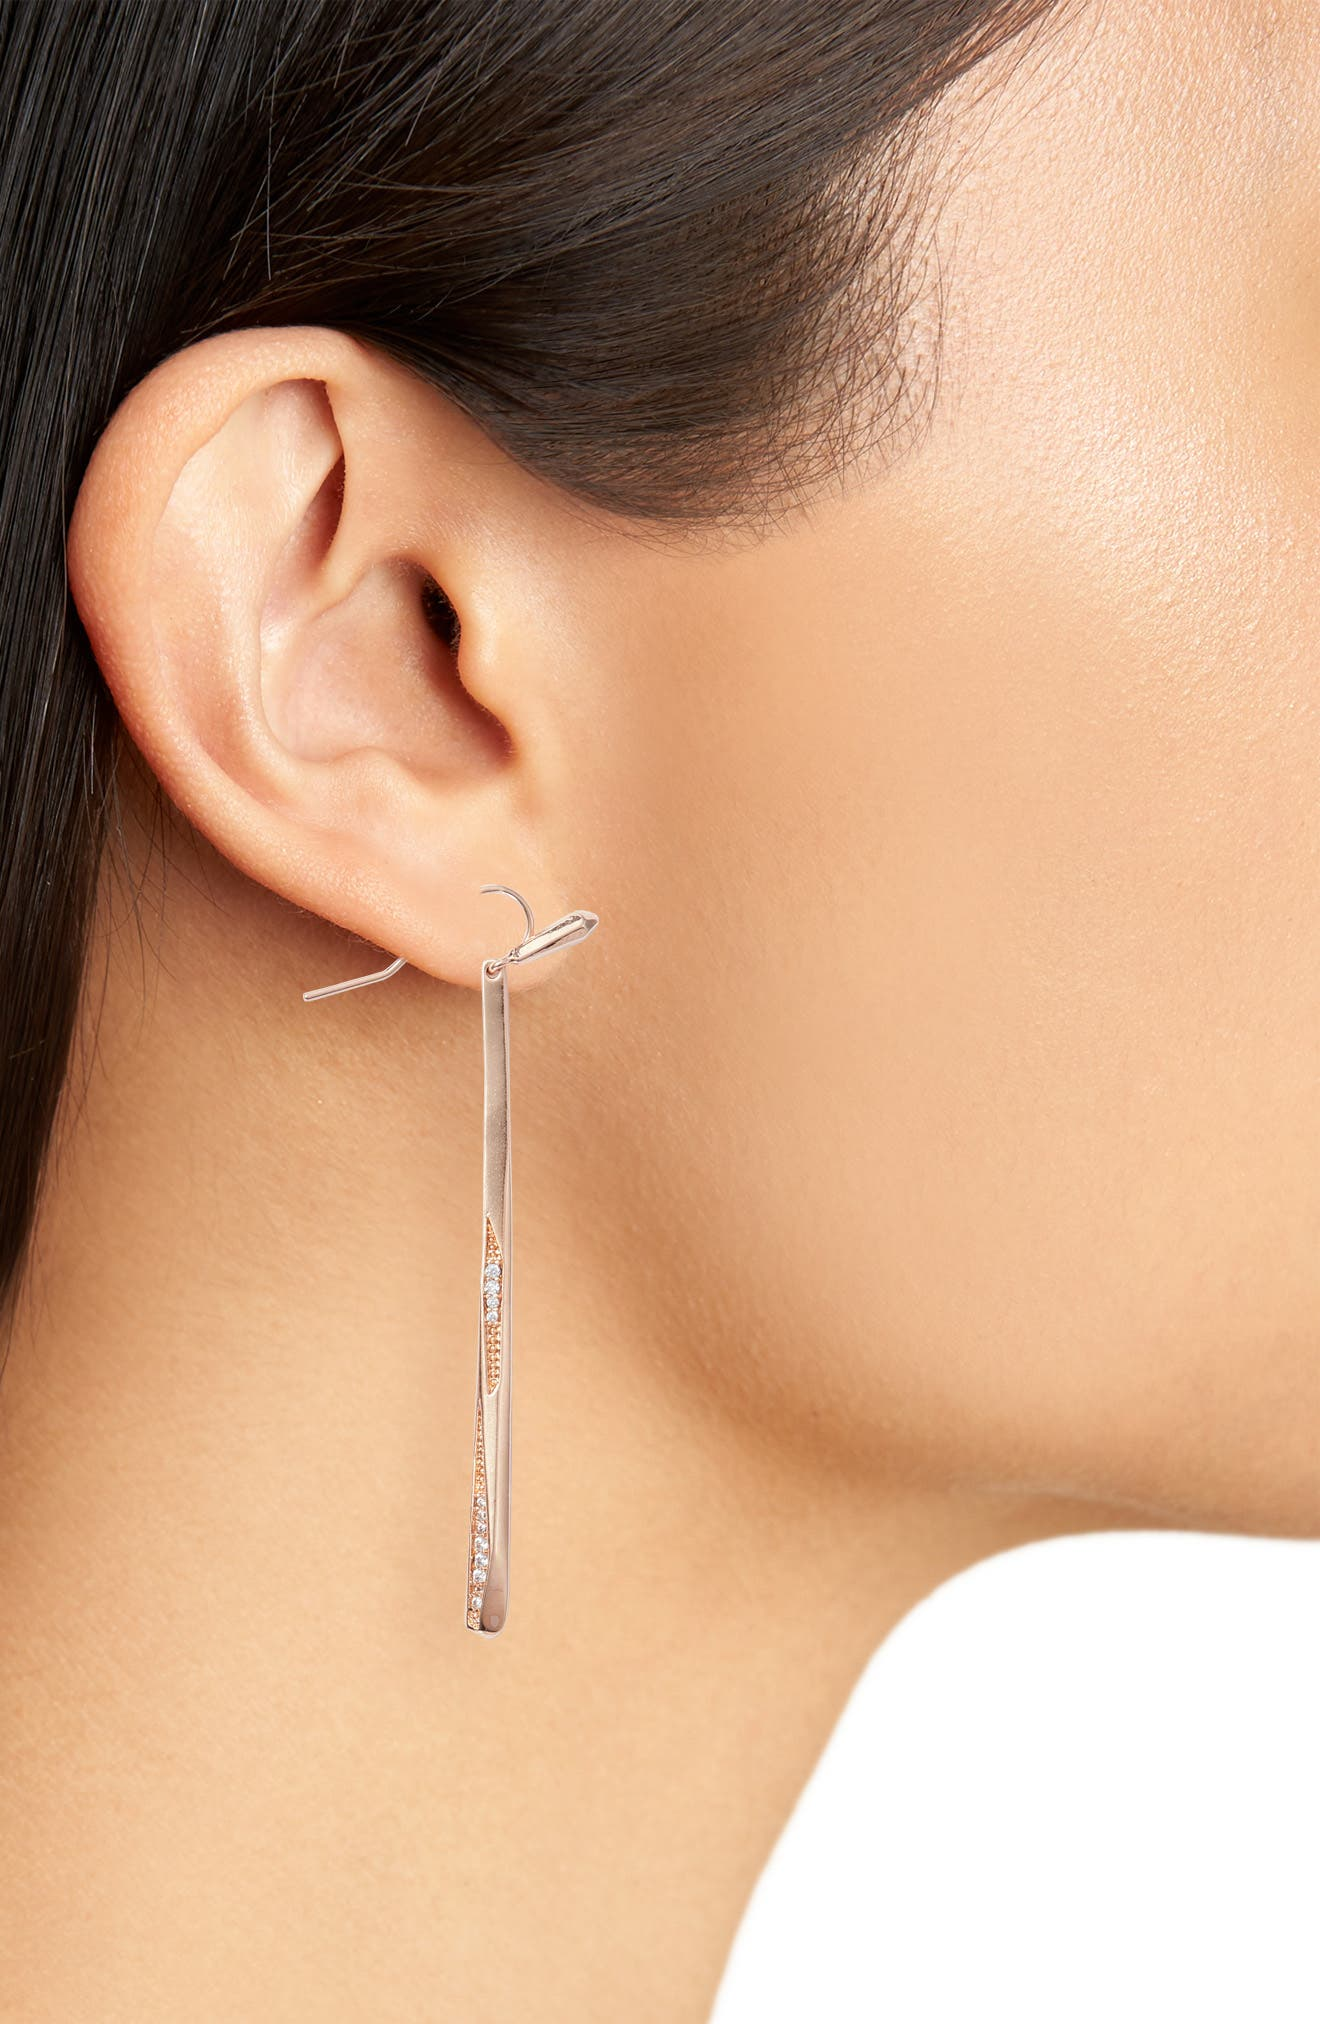 Melissa Drop Earrings,                             Alternate thumbnail 2, color,                             White Cz/ Rose Gold